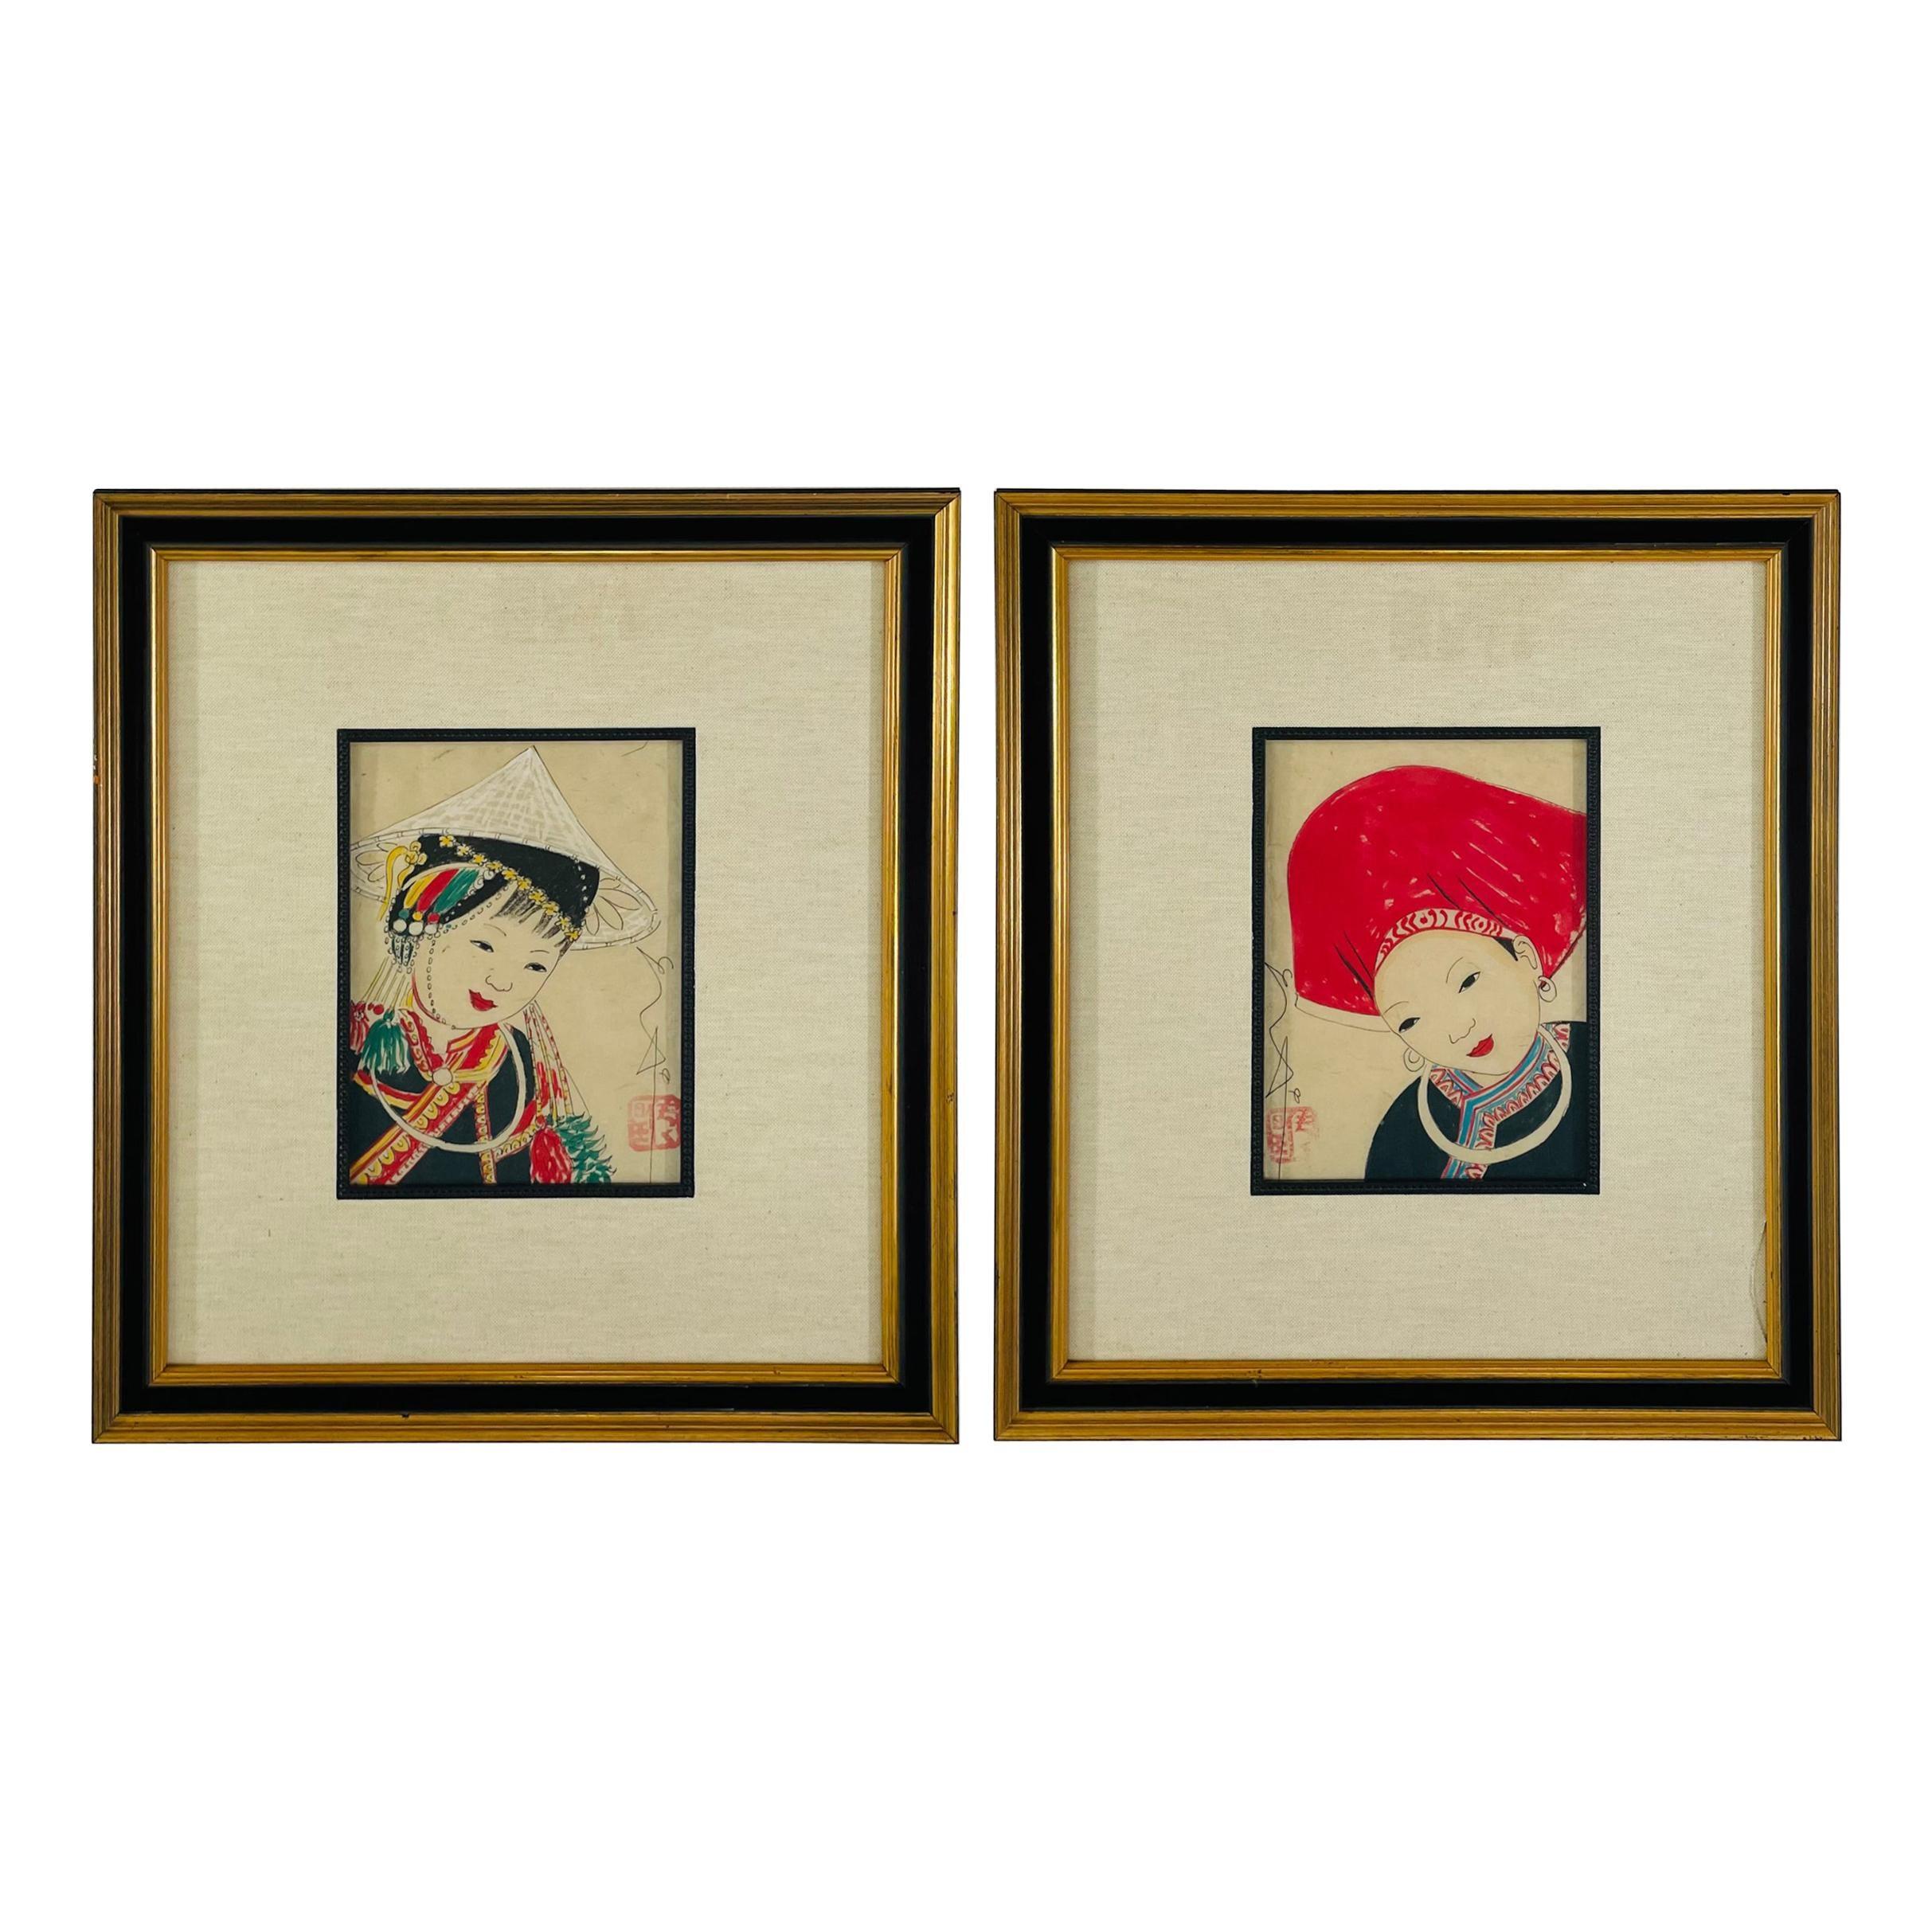 Antique Japanese Asian Women Portrait Etching Print Signed, a Pair